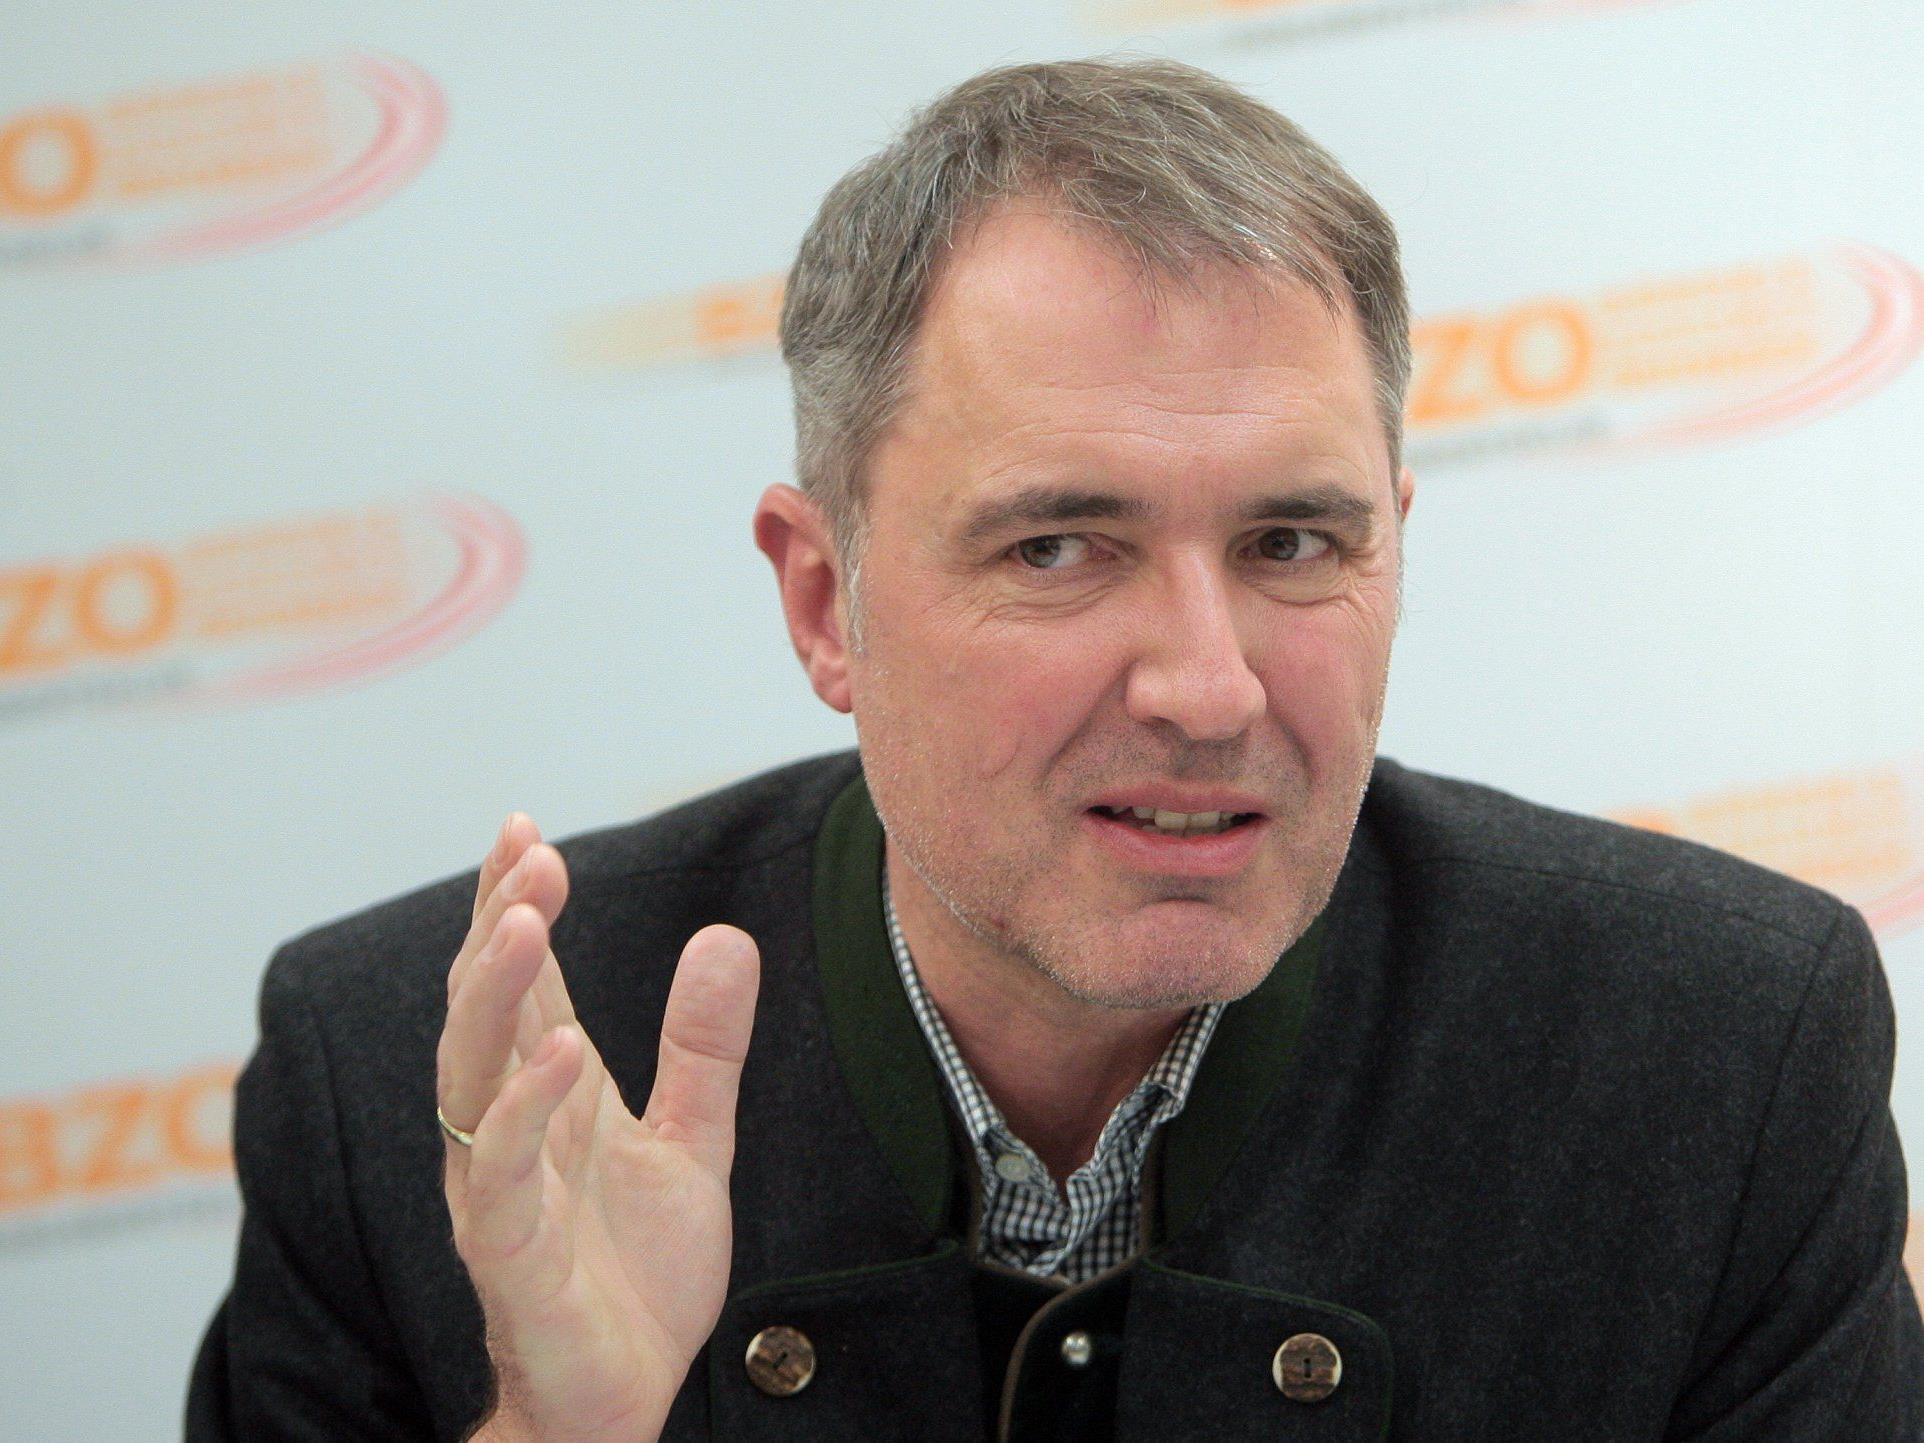 BZÖ-Europaabgeordneter war Wahlbeobachter in Samara